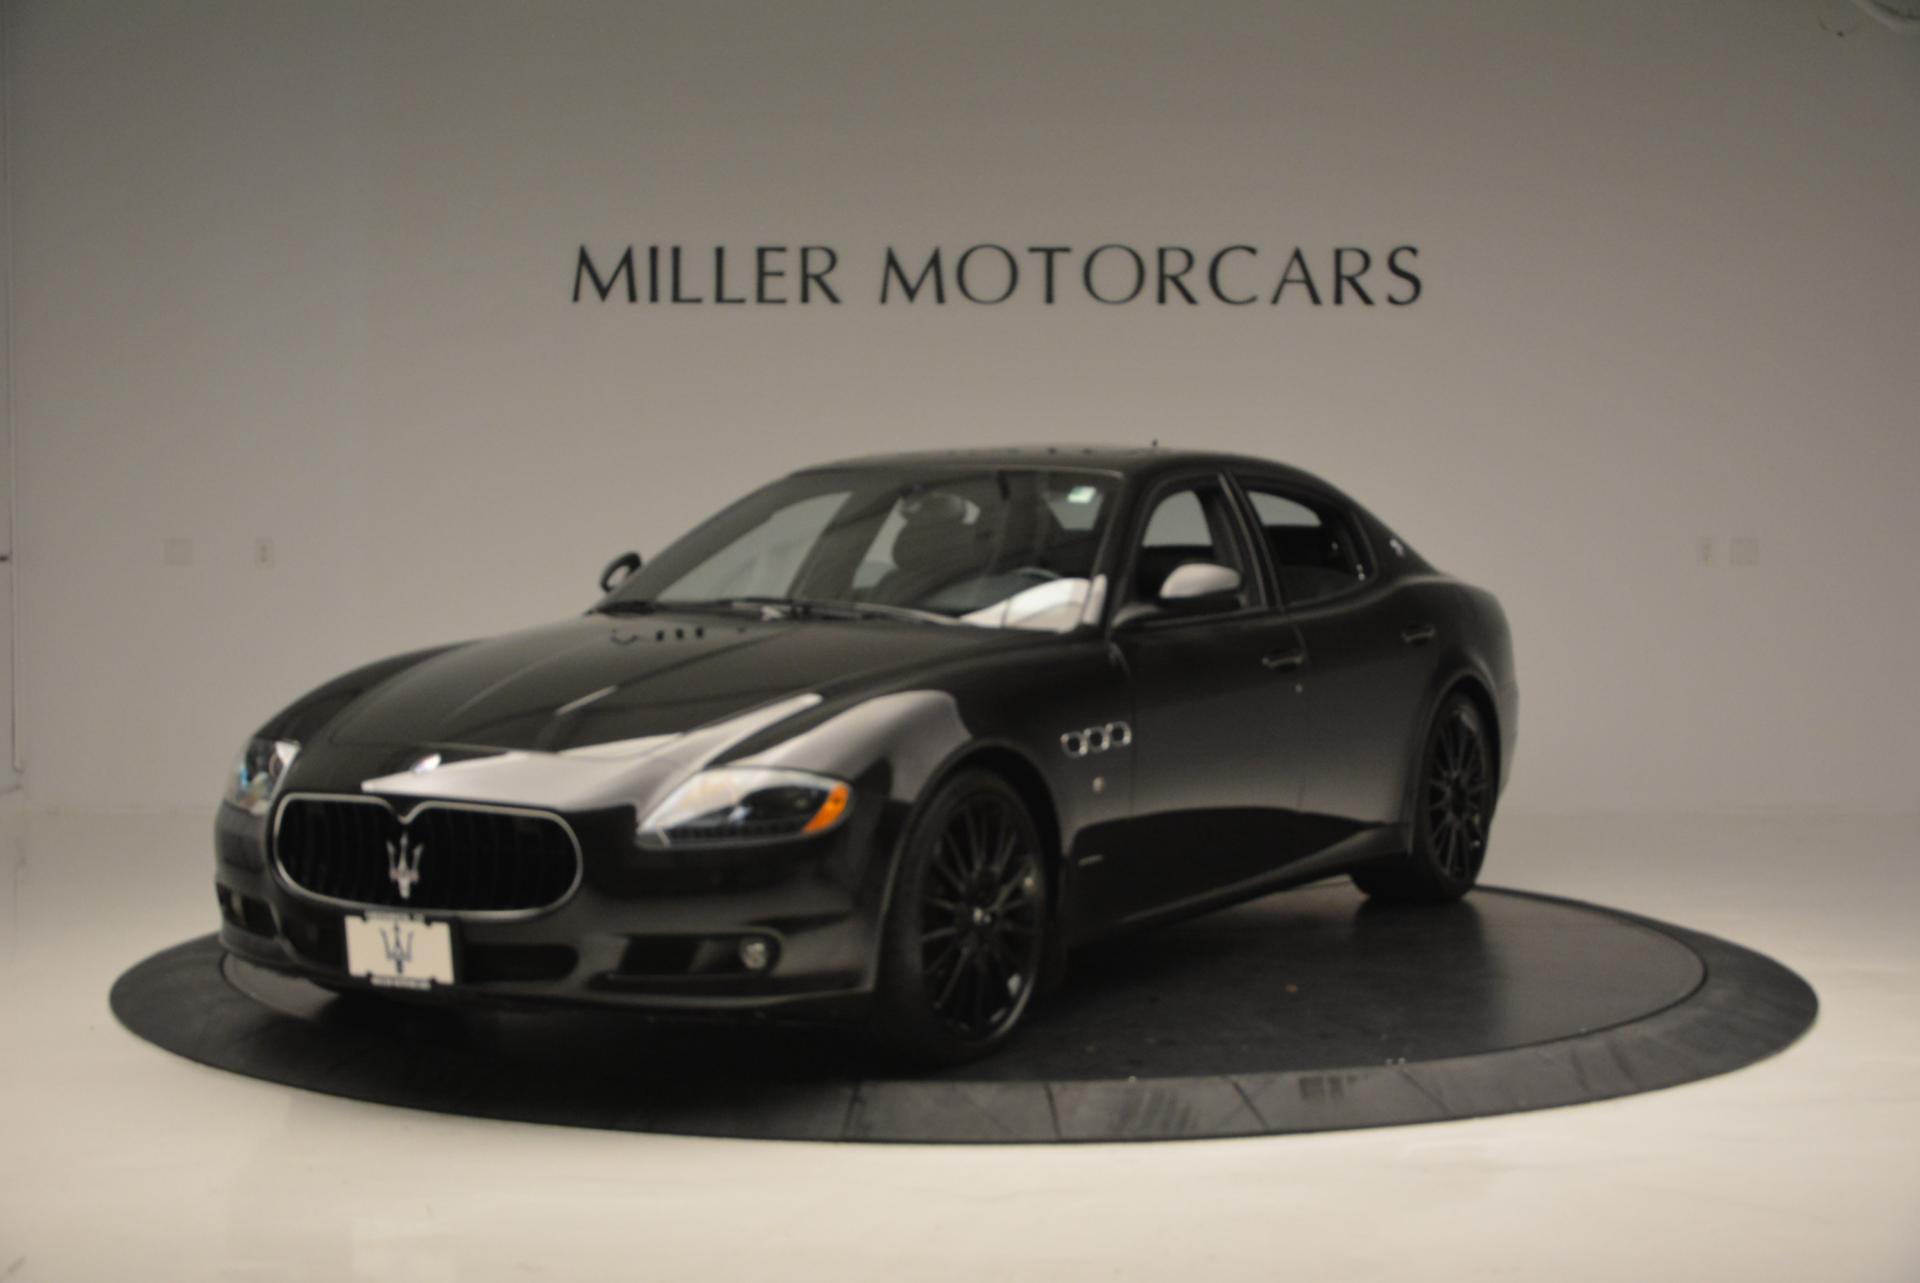 Used 2011 Maserati Quattroporte Sport GT S for sale Sold at Alfa Romeo of Greenwich in Greenwich CT 06830 1